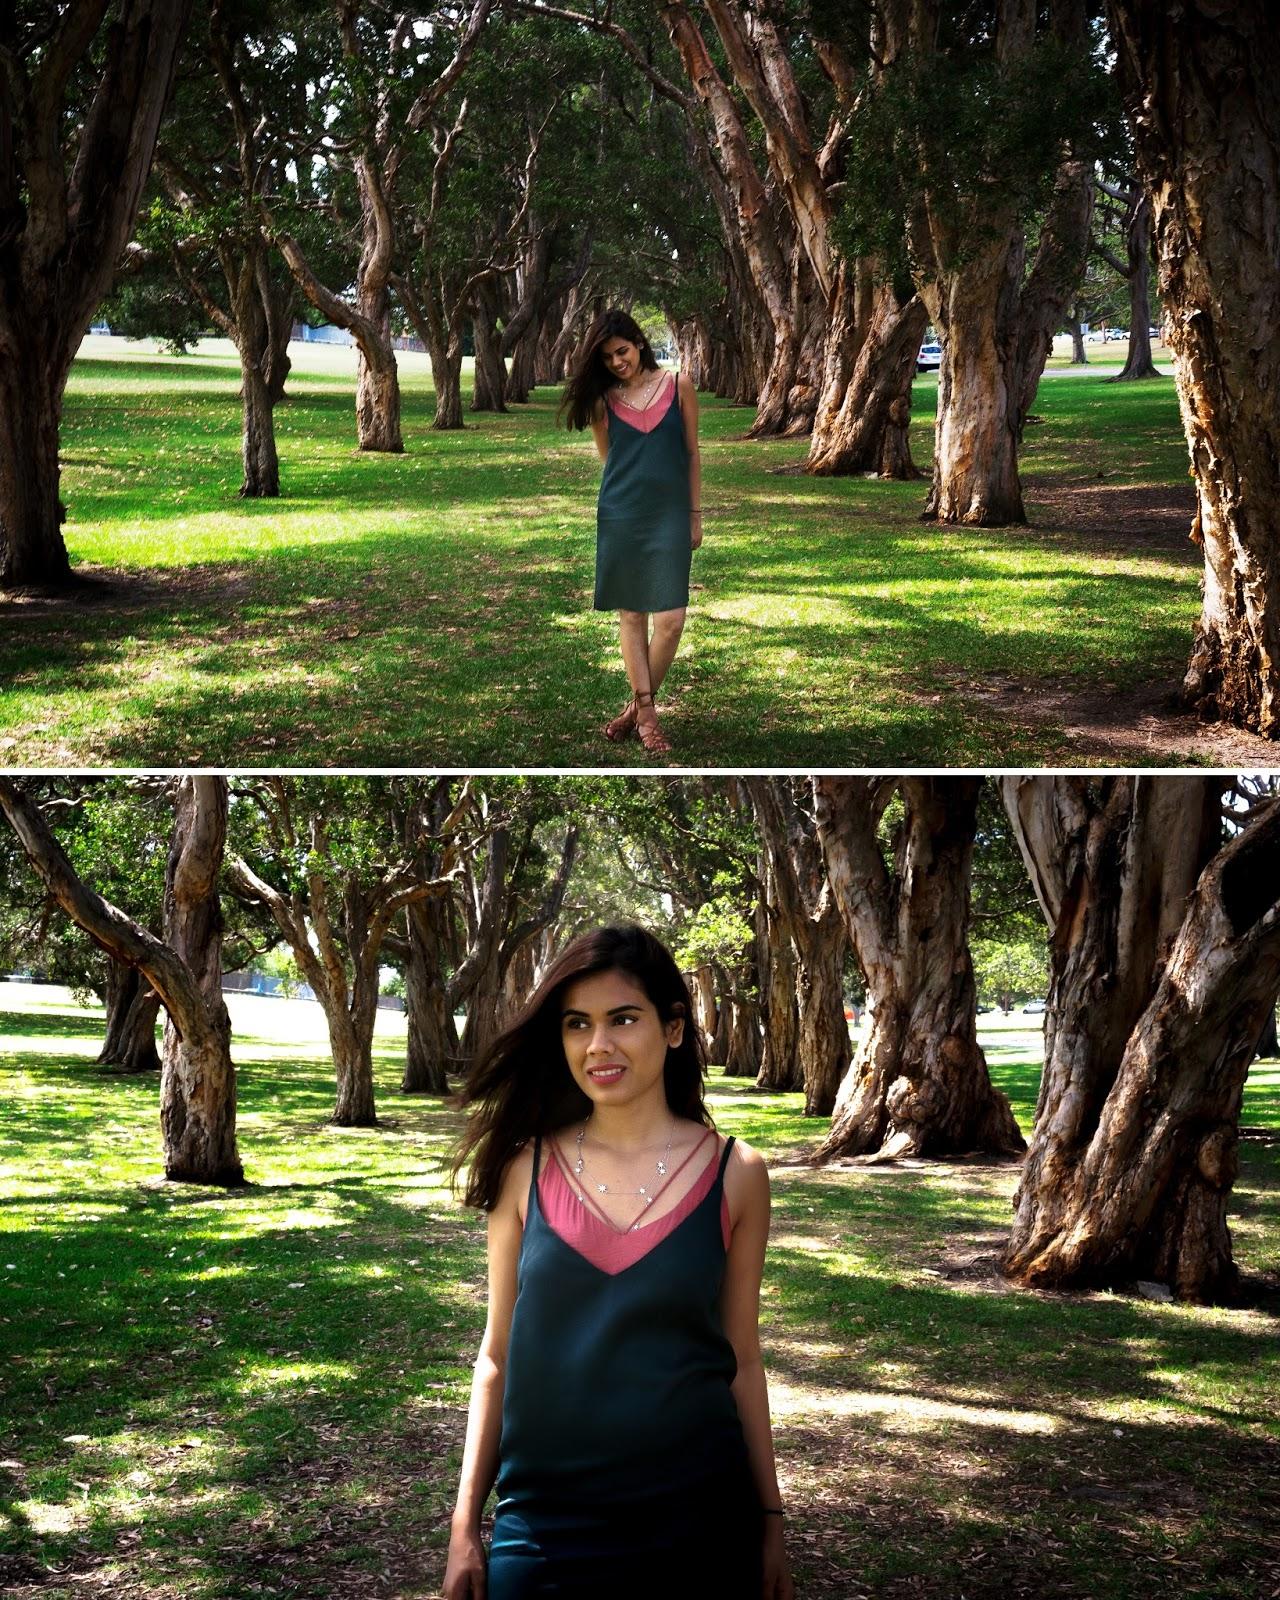 New Look 2 In 1 90s Lace Slip Dress in Centennial Parklands Sydney